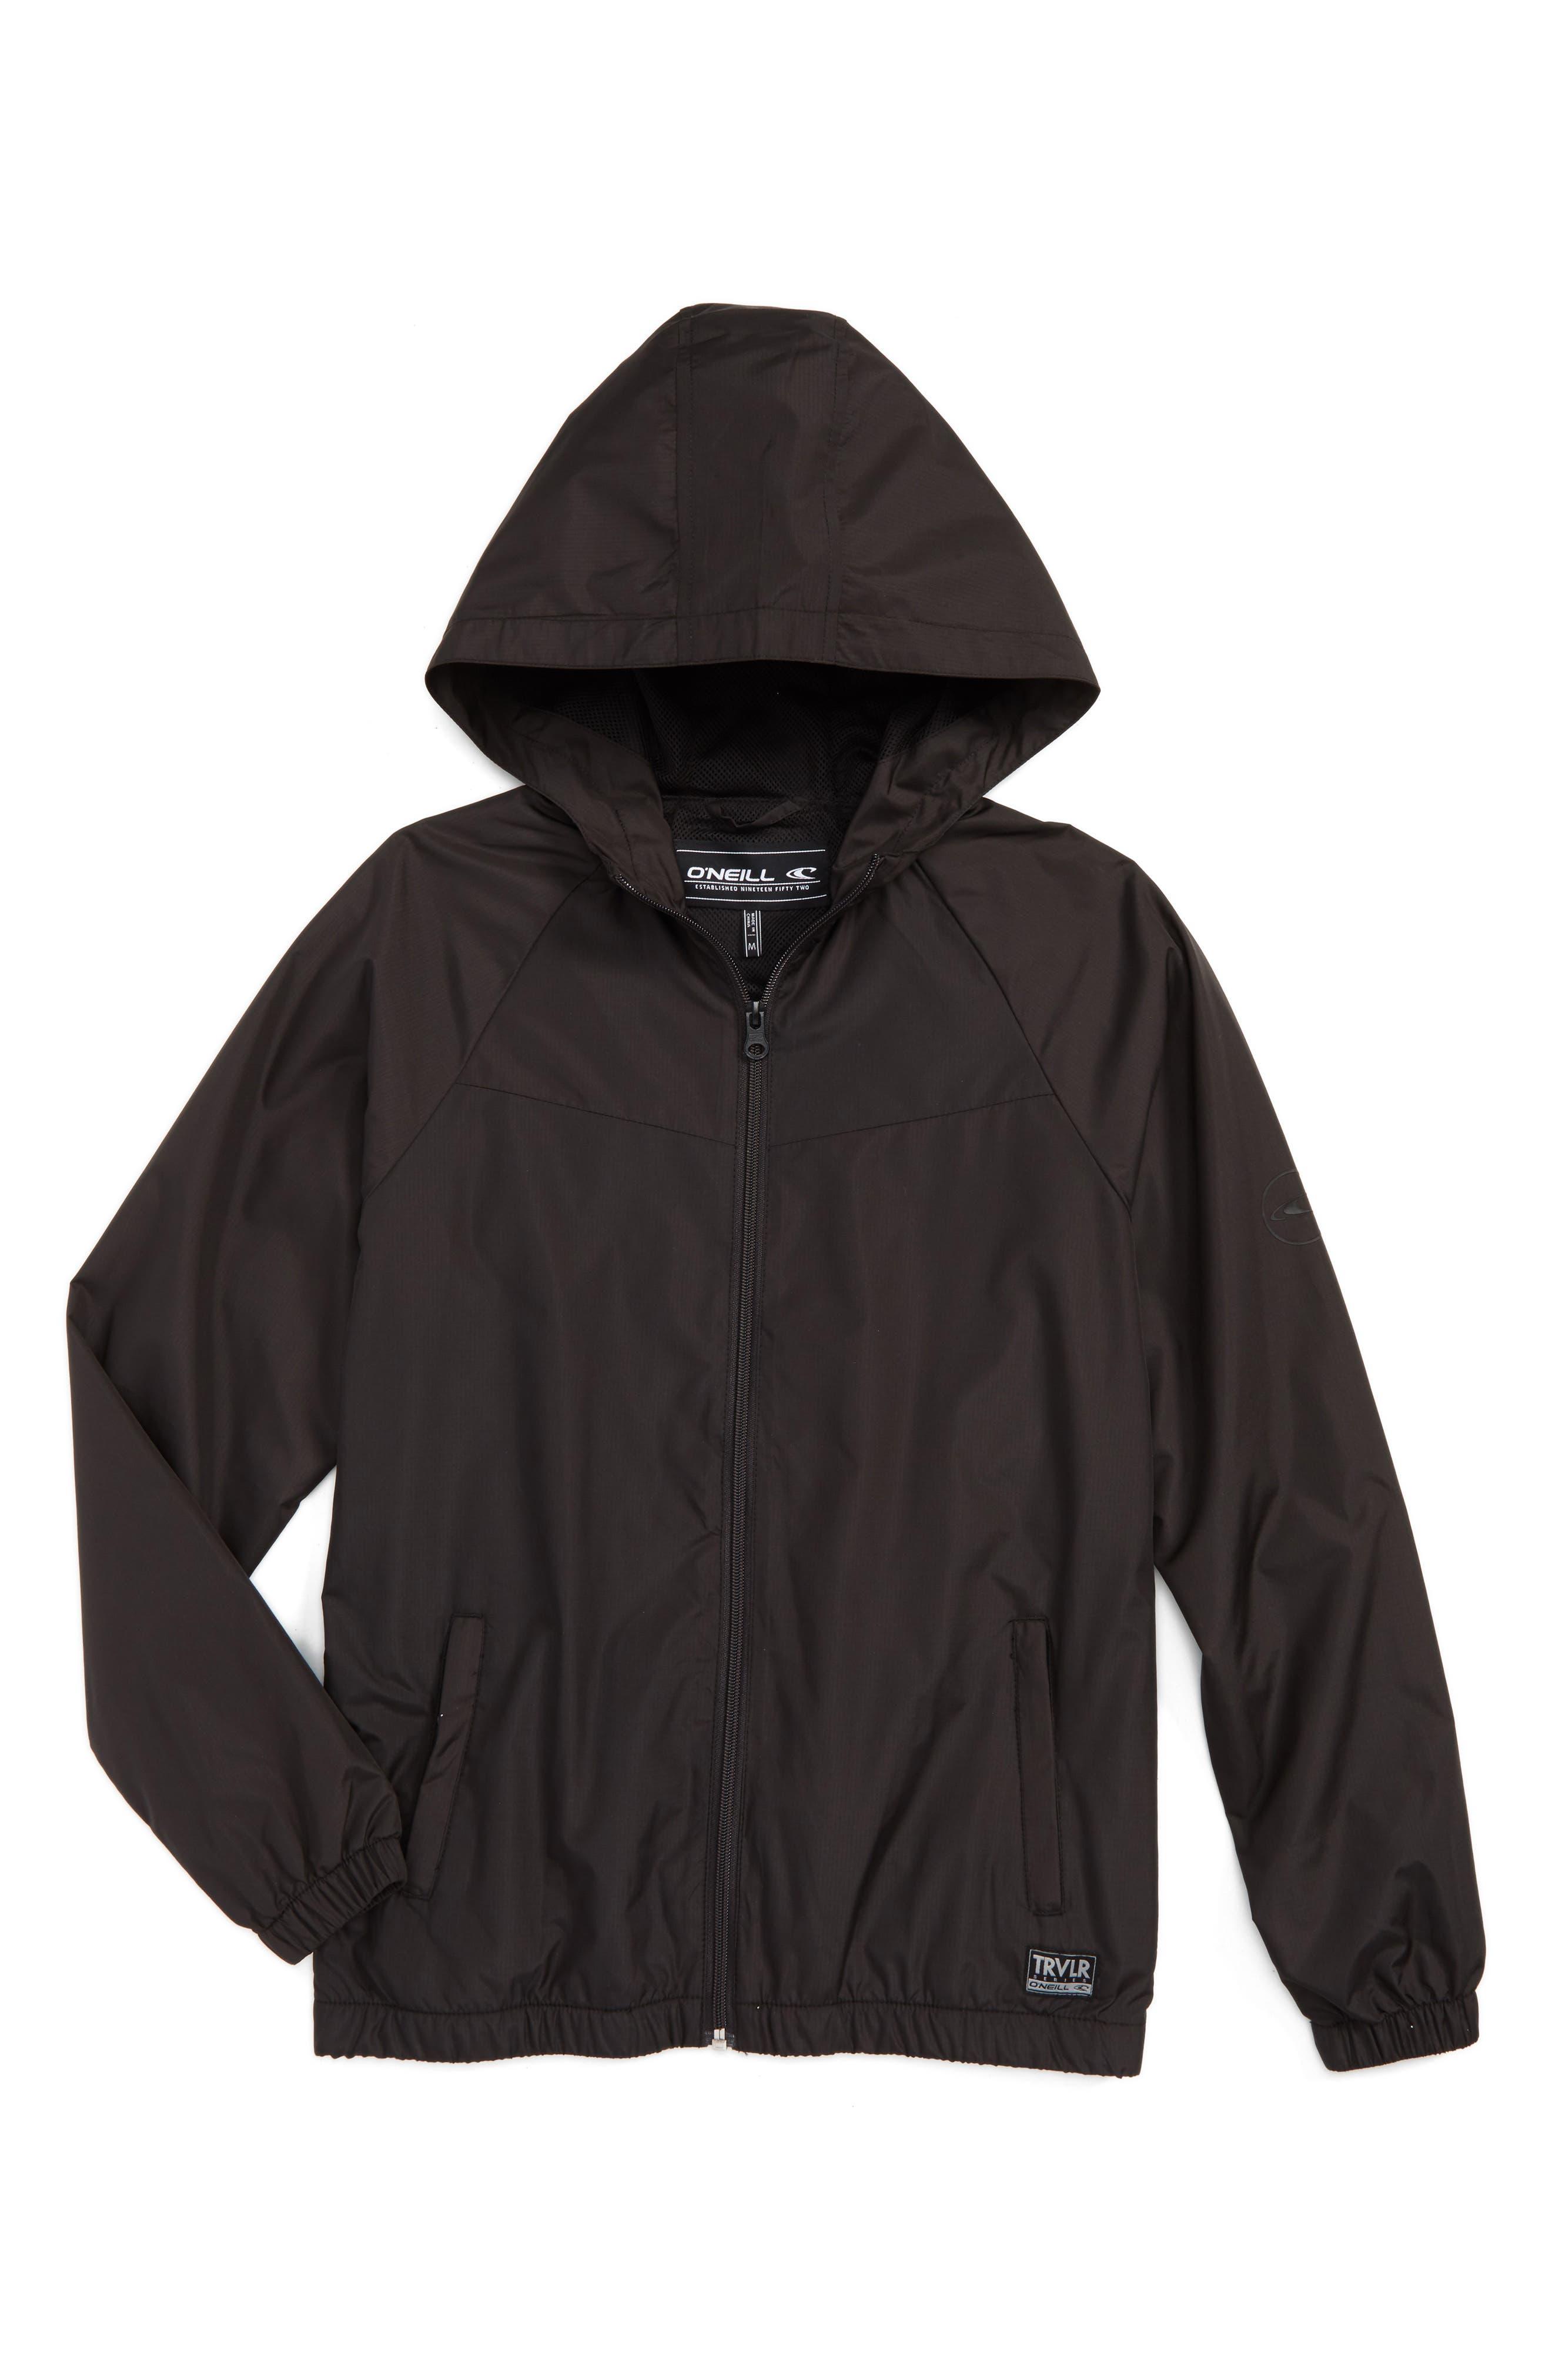 ONEILL Traveler Packable Windbreaker Jacket